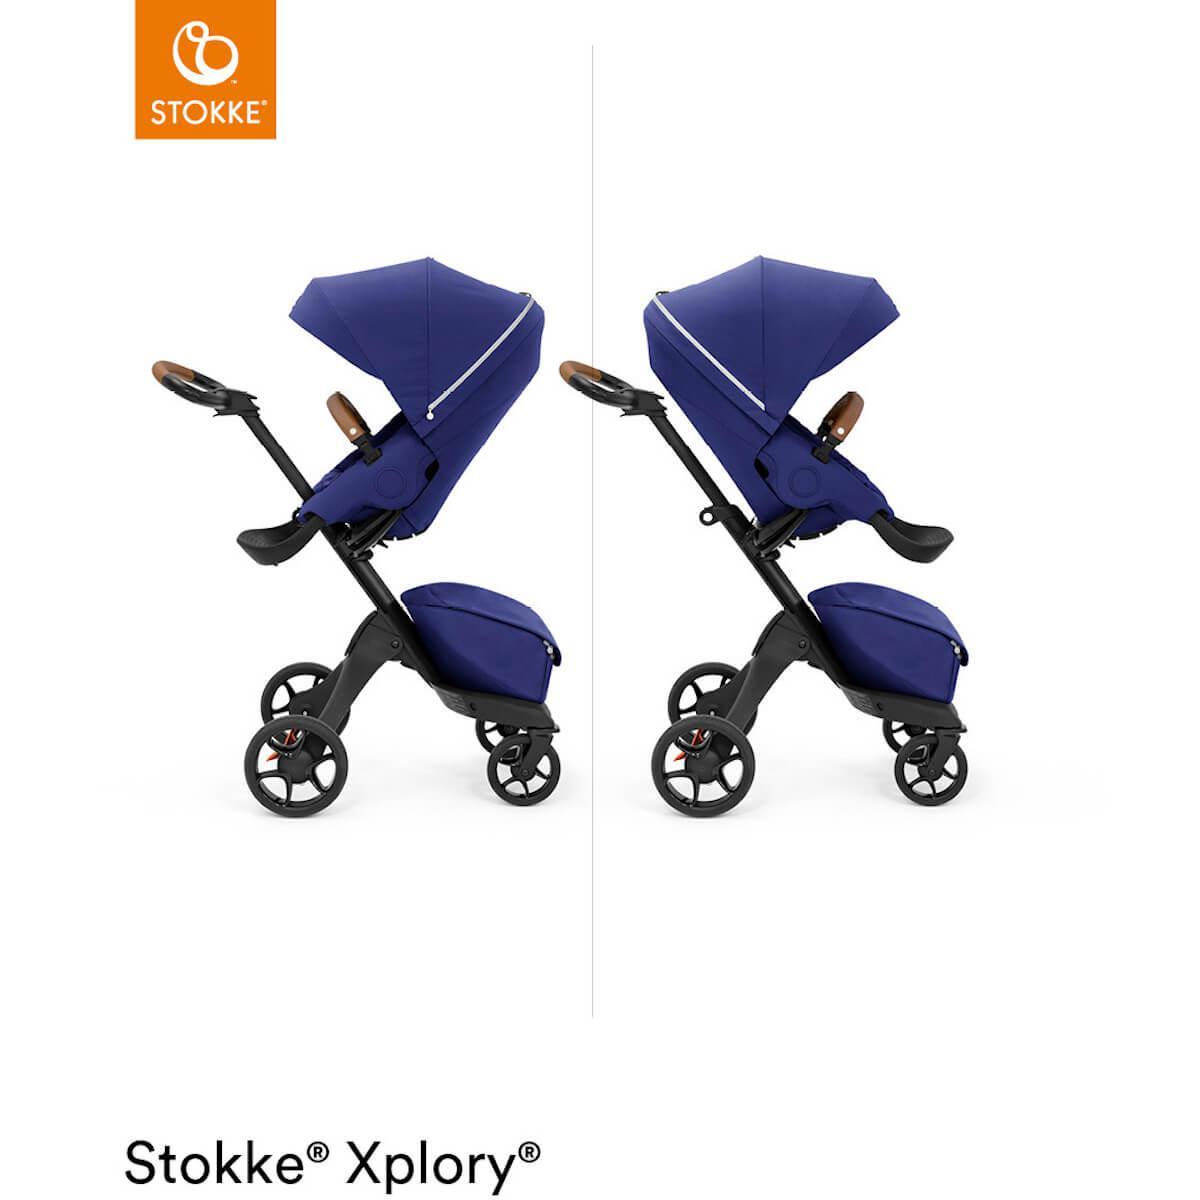 Kinderwagen XPLORY X Stokke Royal Blue